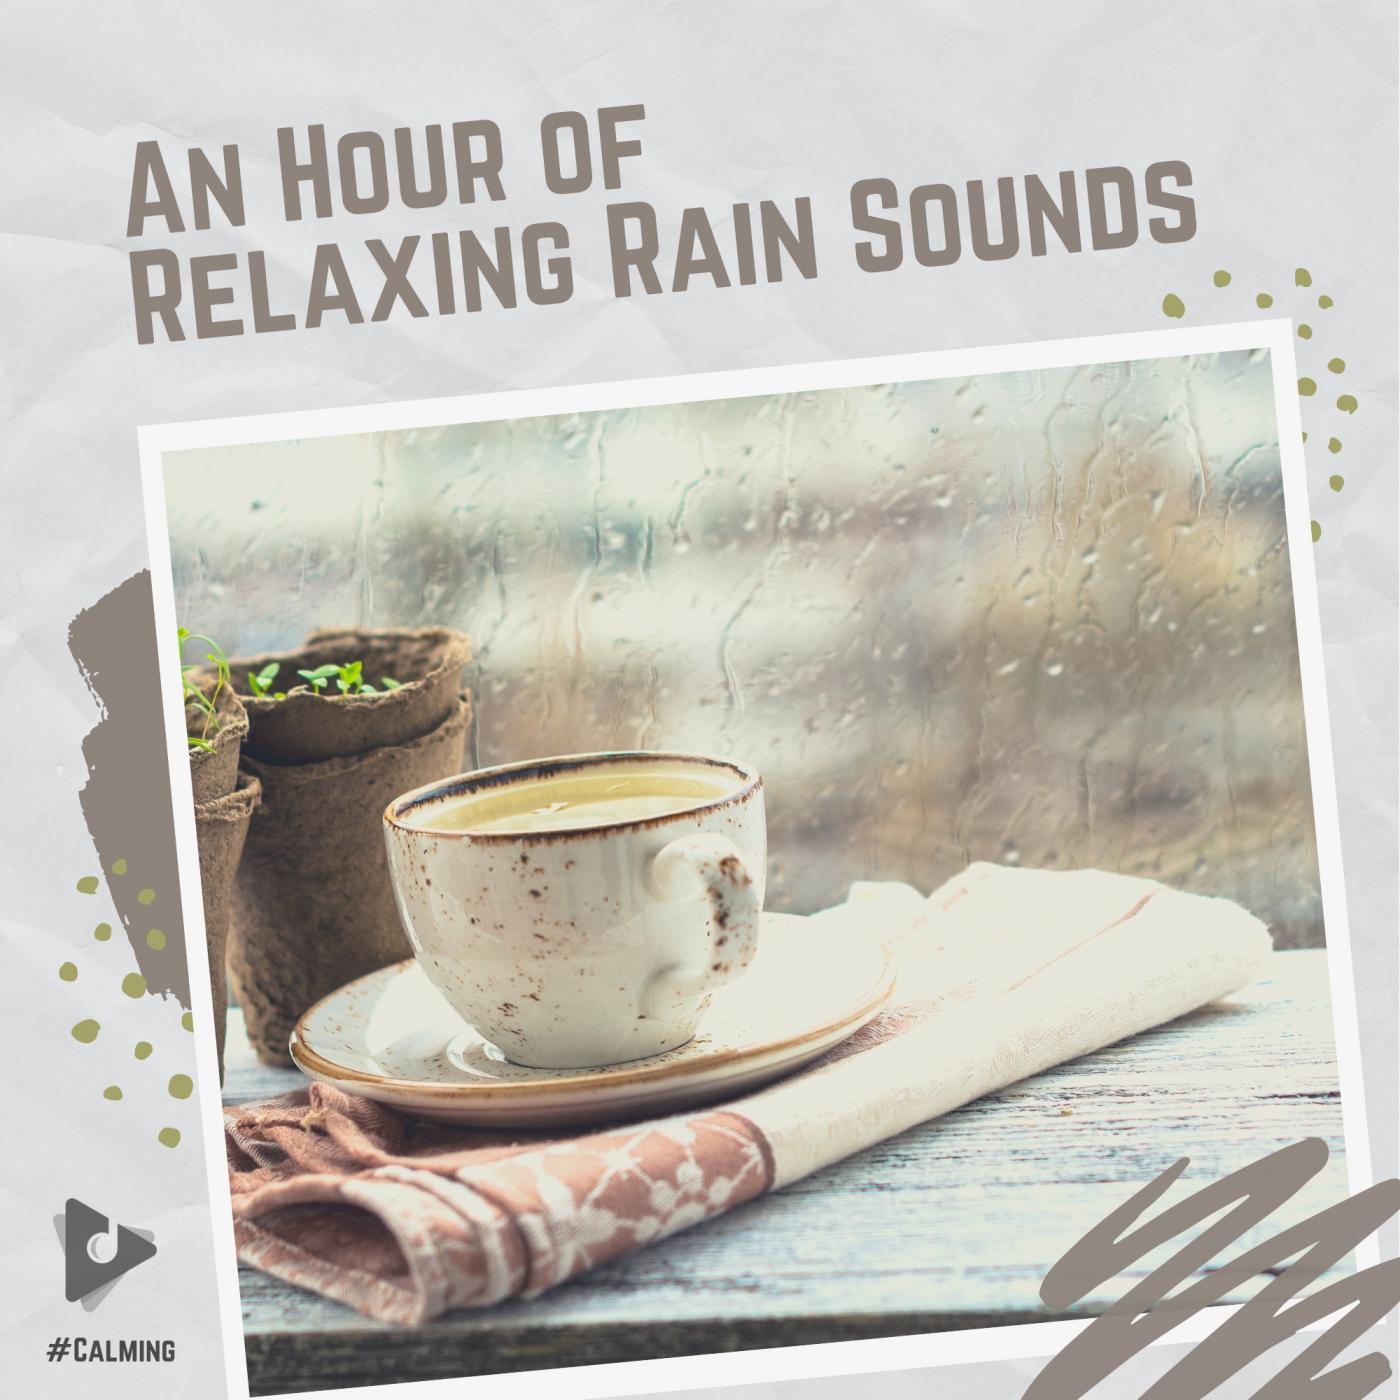 An Hour of Relaxing Rain Sounds